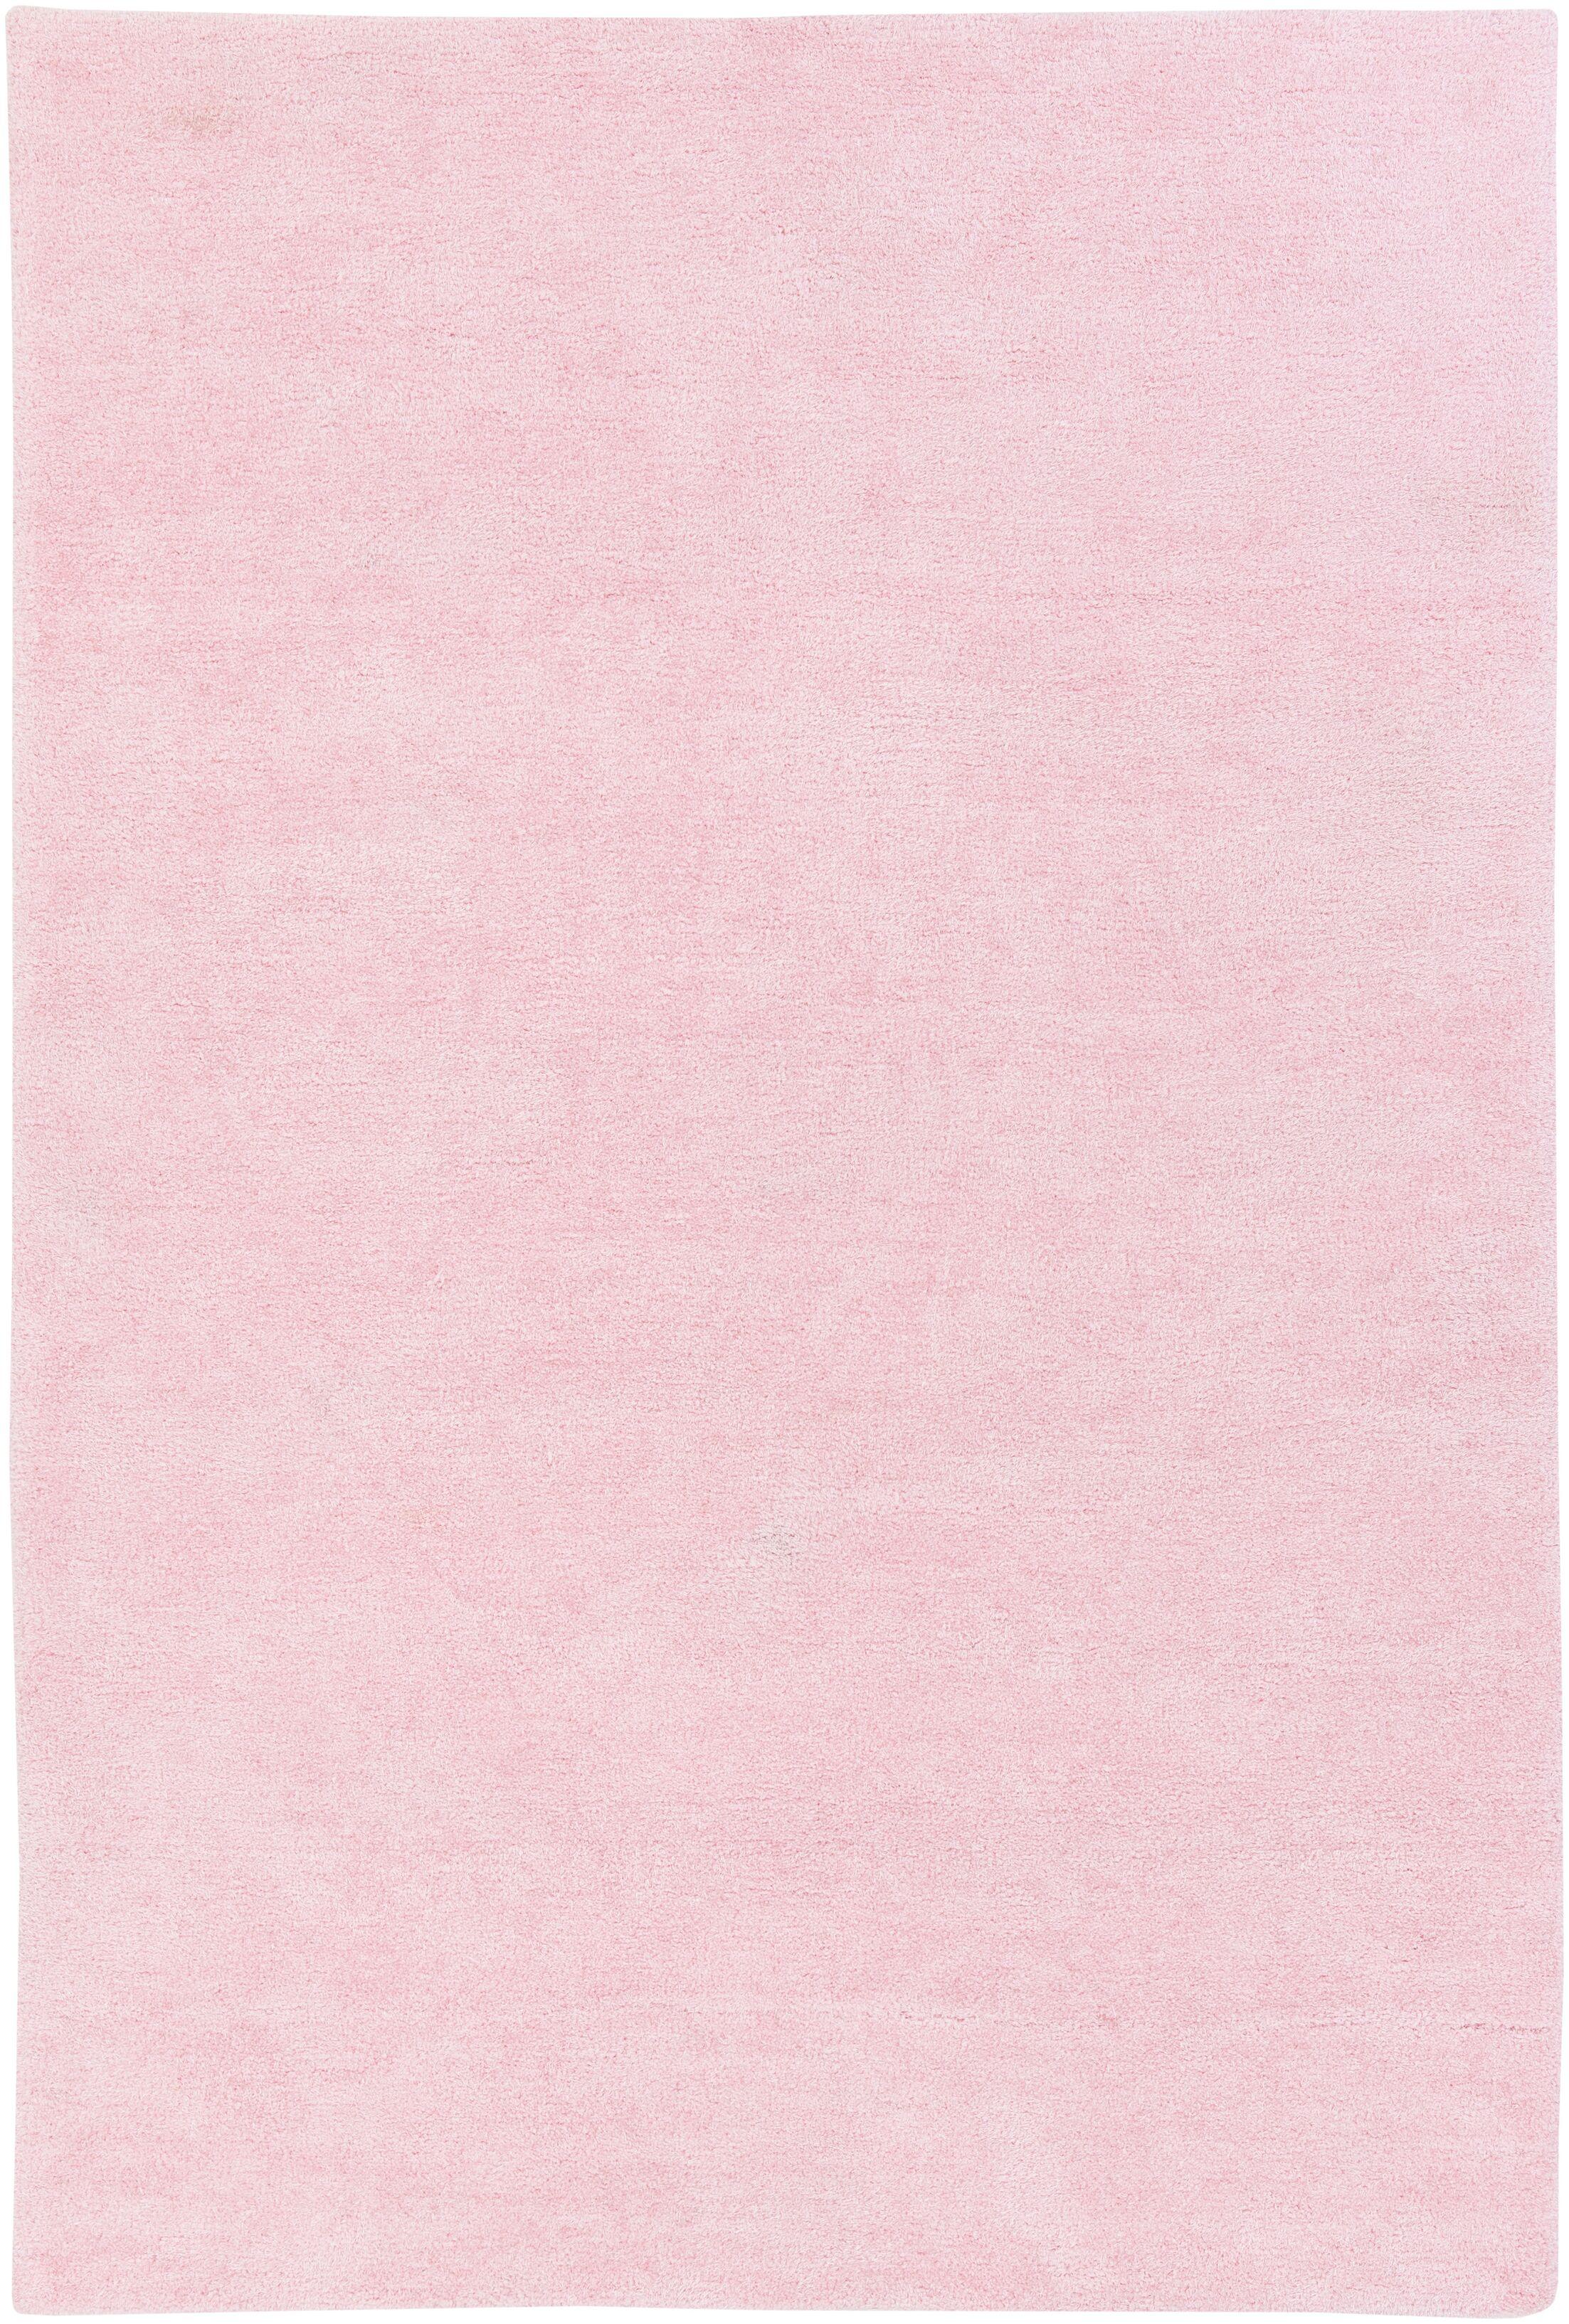 Eckman Light Pink Area Rug Rug Size: Rectangle 8' x 11'